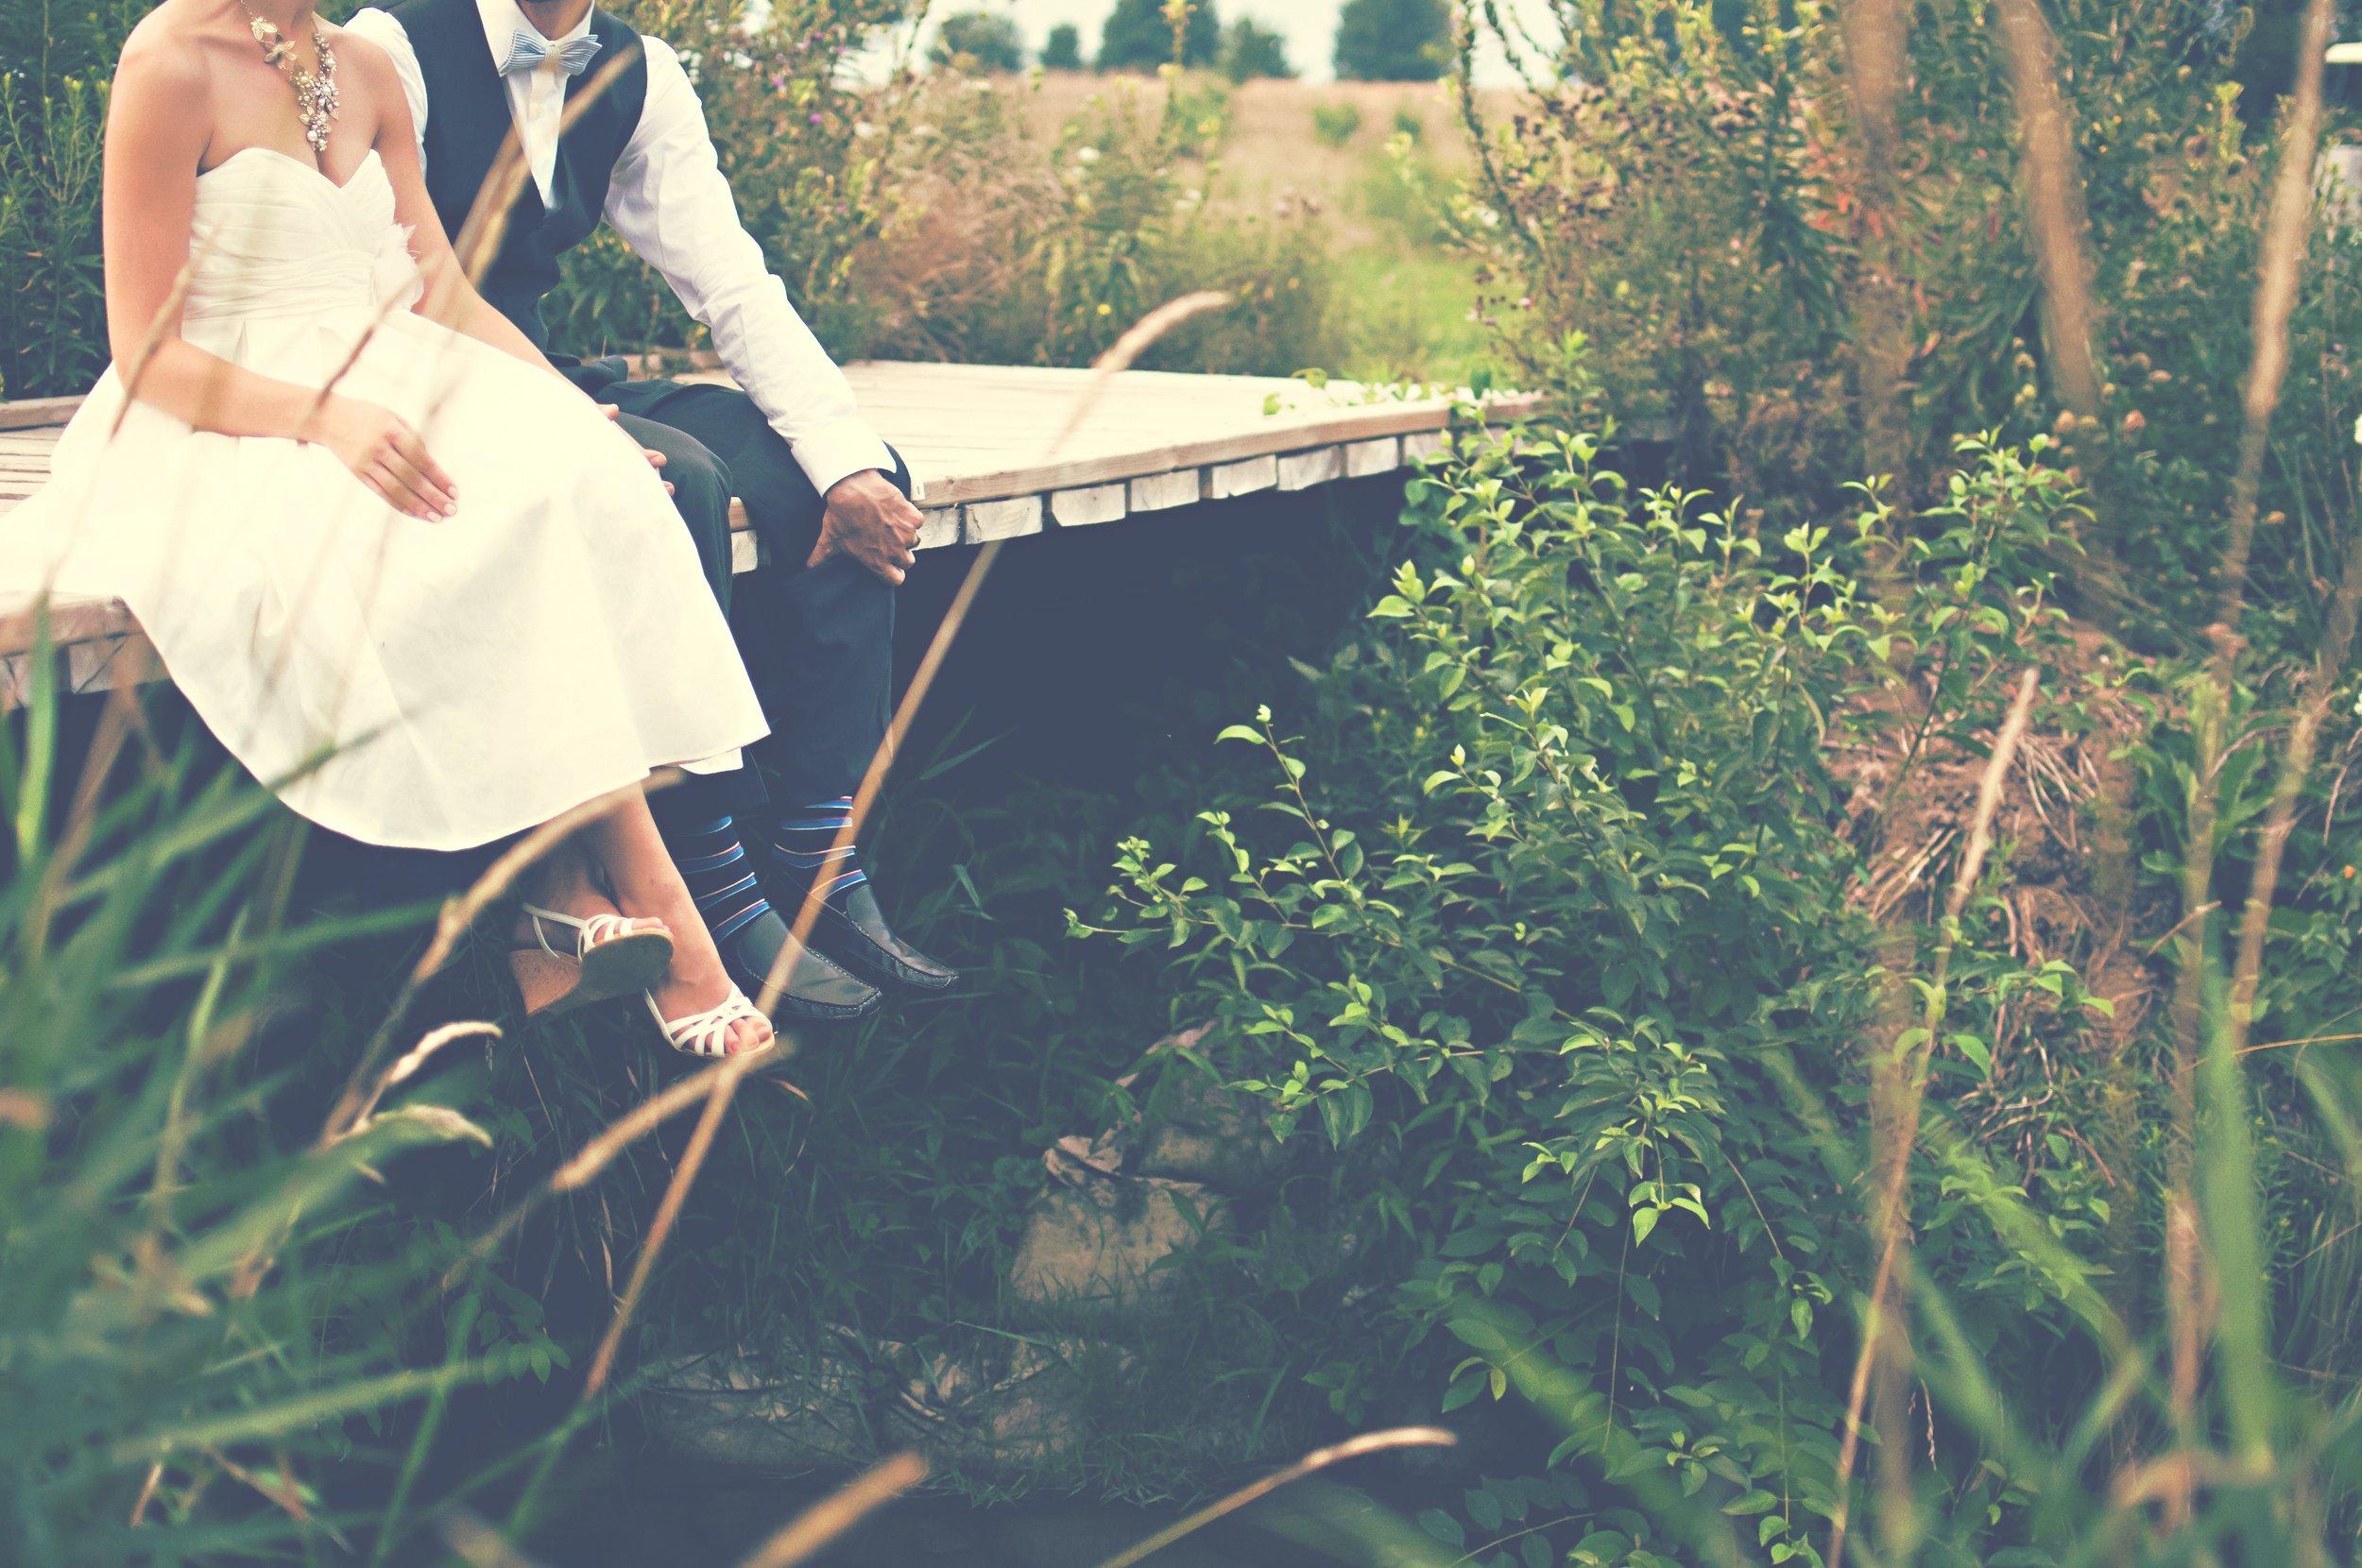 bride-bridge-couple-136422.jpg